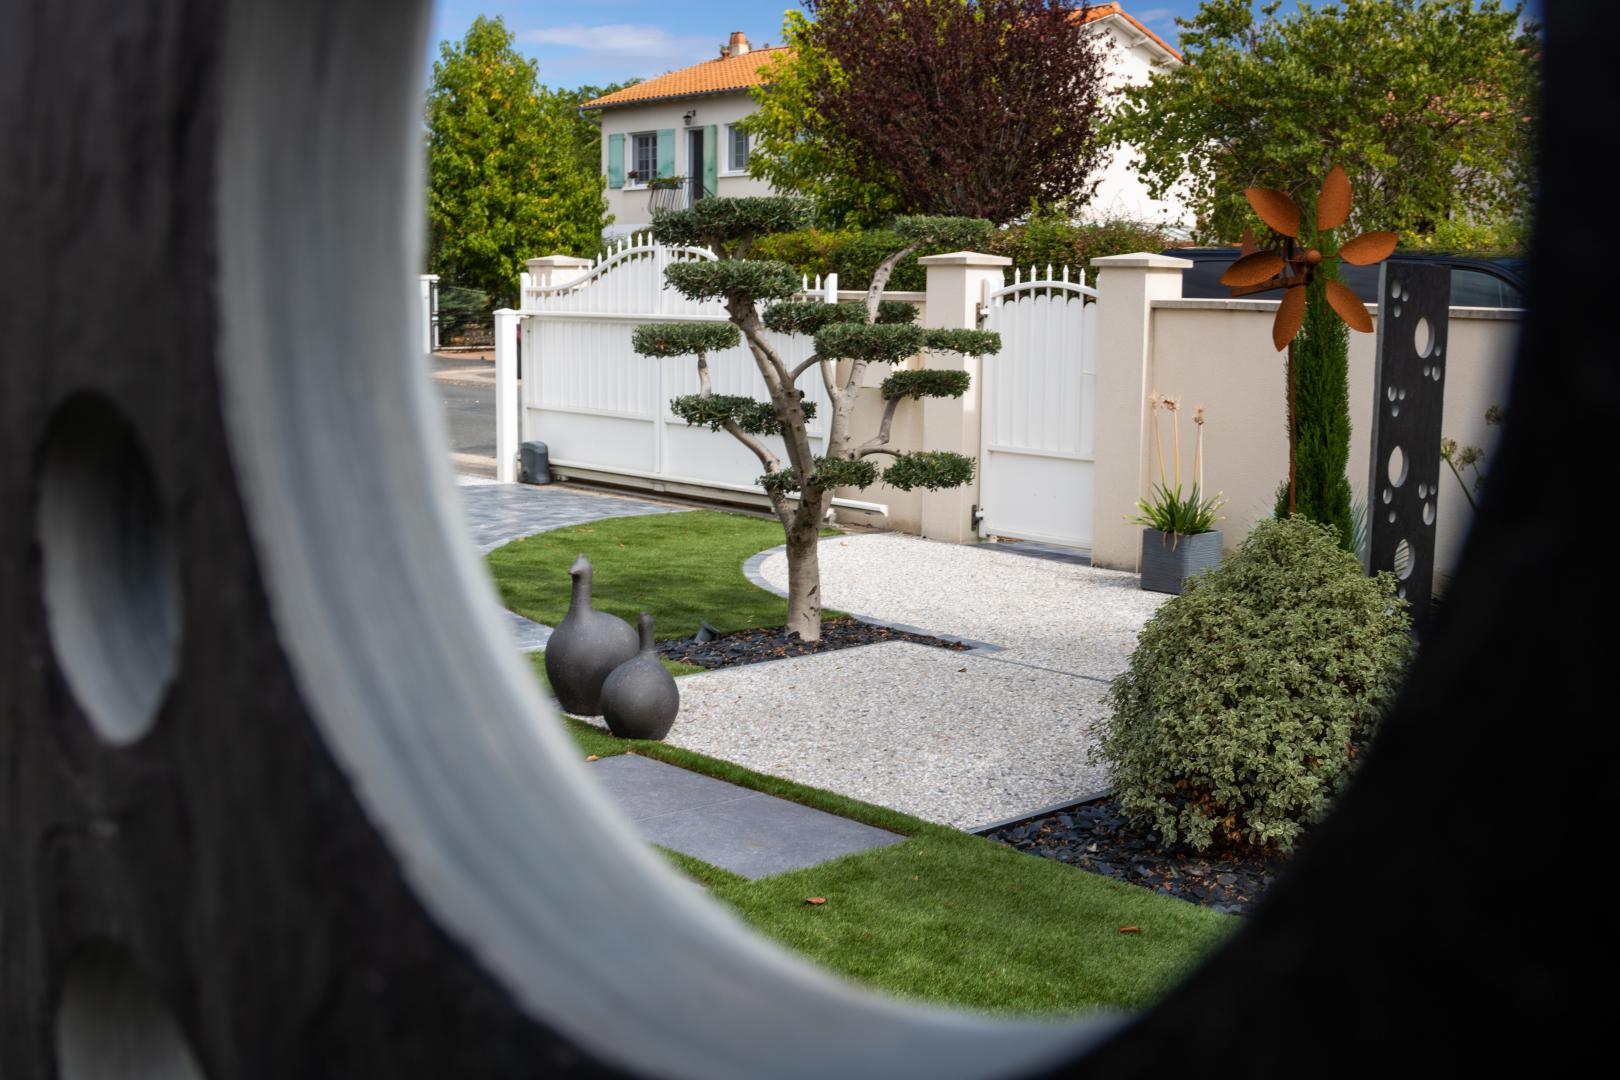 Aménagement De Jardin Niort, Parthenay, Fontenay-Le-Comte ... serapportantà Specialiste Du Jardin